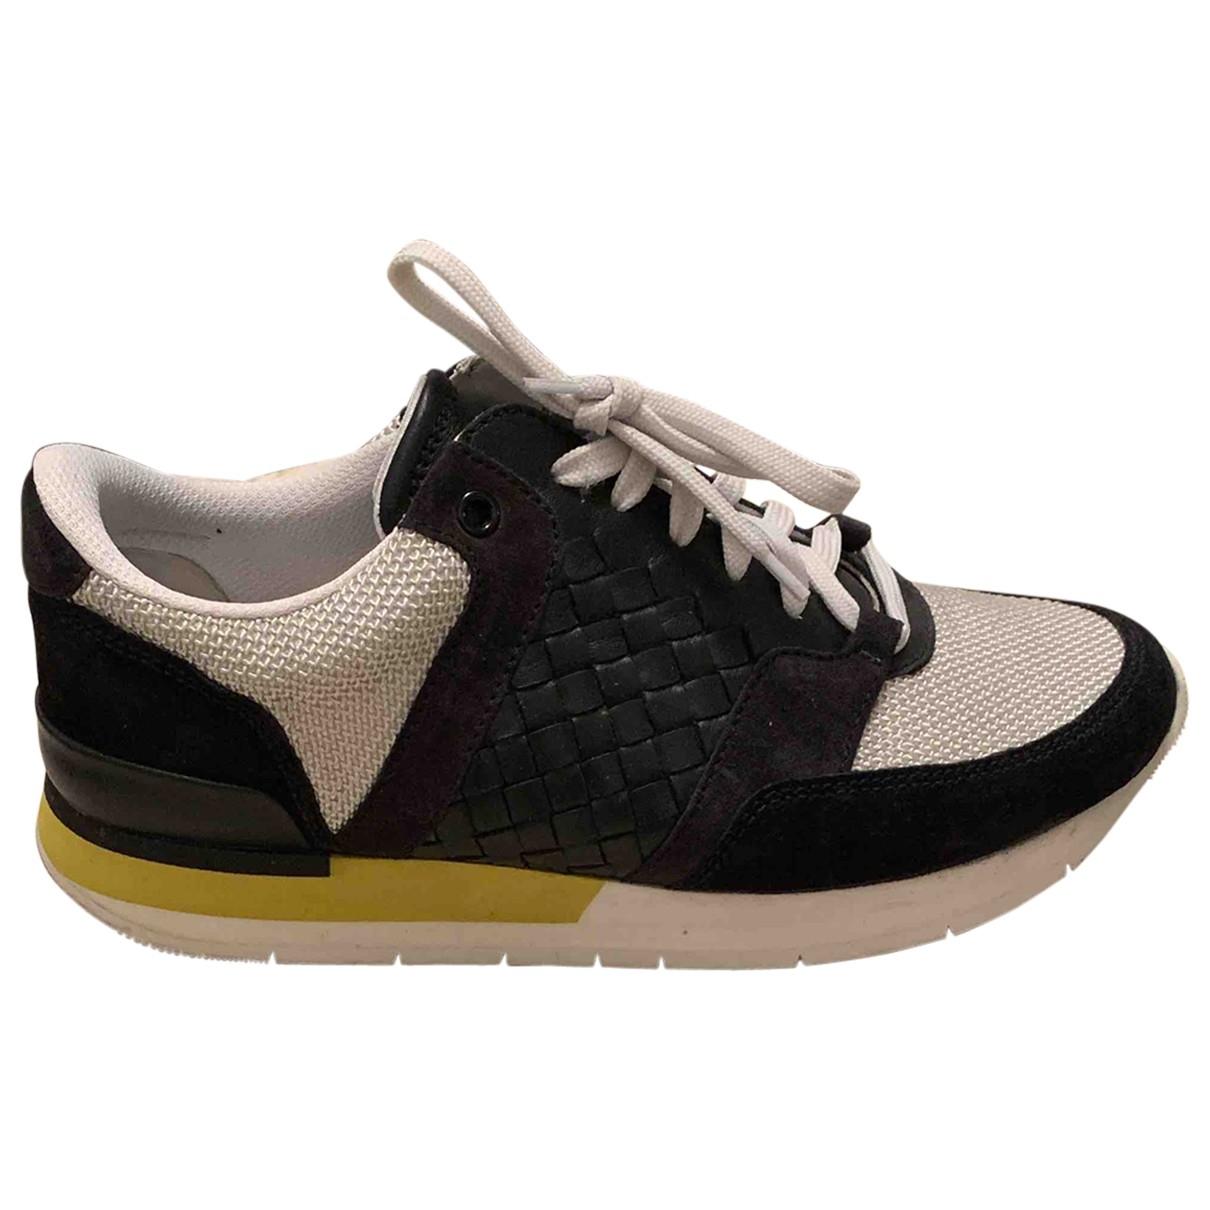 Bottega Veneta \N Black Leather Trainers for Women 39 EU